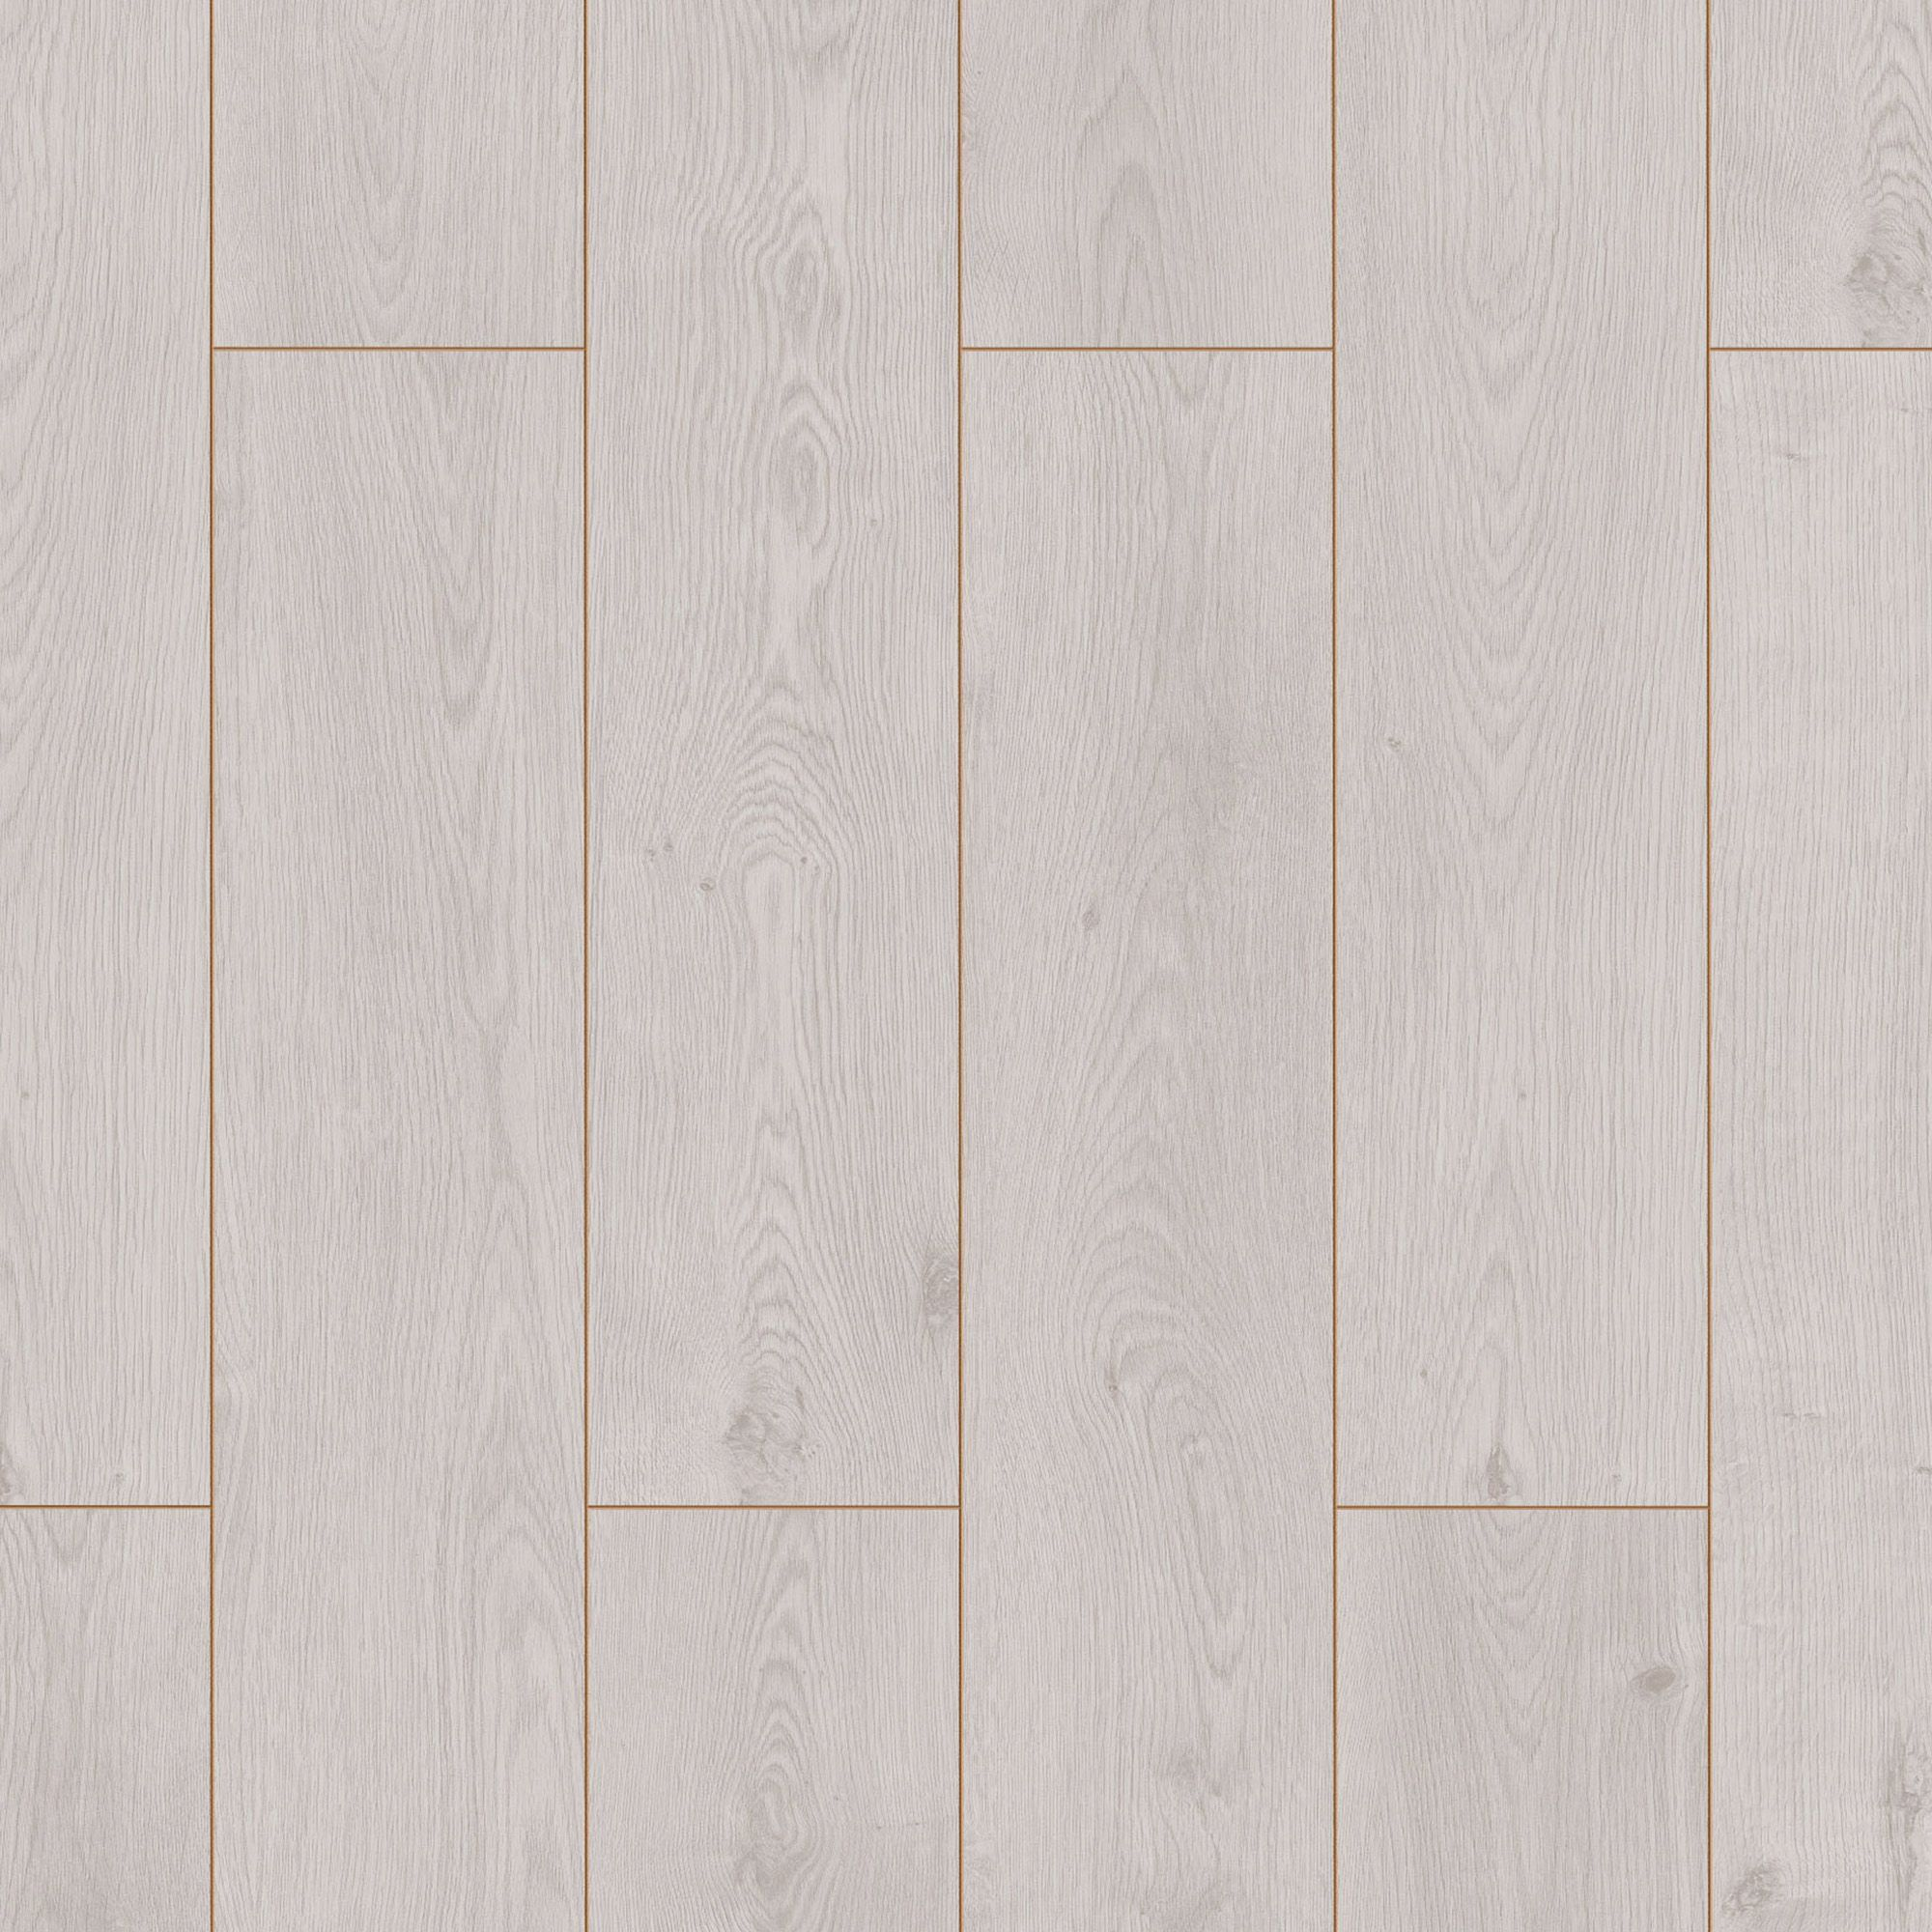 Kitchen Tile Effect Laminate Flooring Overture Arlington Oak Effect Laminate Flooring 125 Ma2 Pack